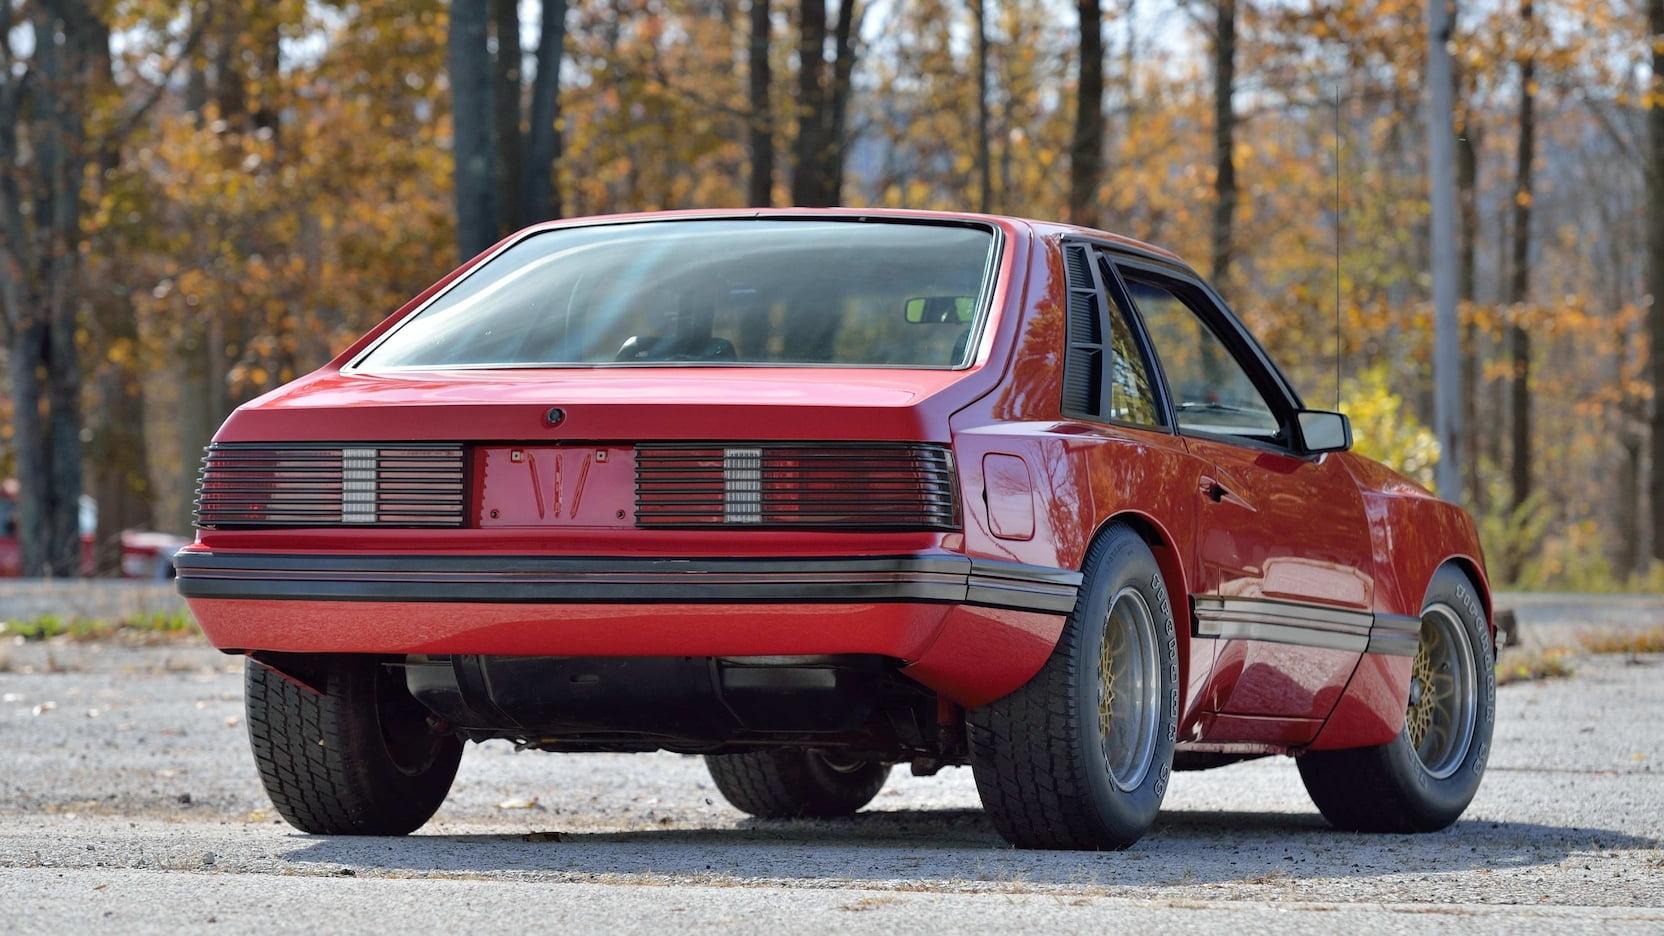 1980 Mercury Cosworth Capri rear 3/4